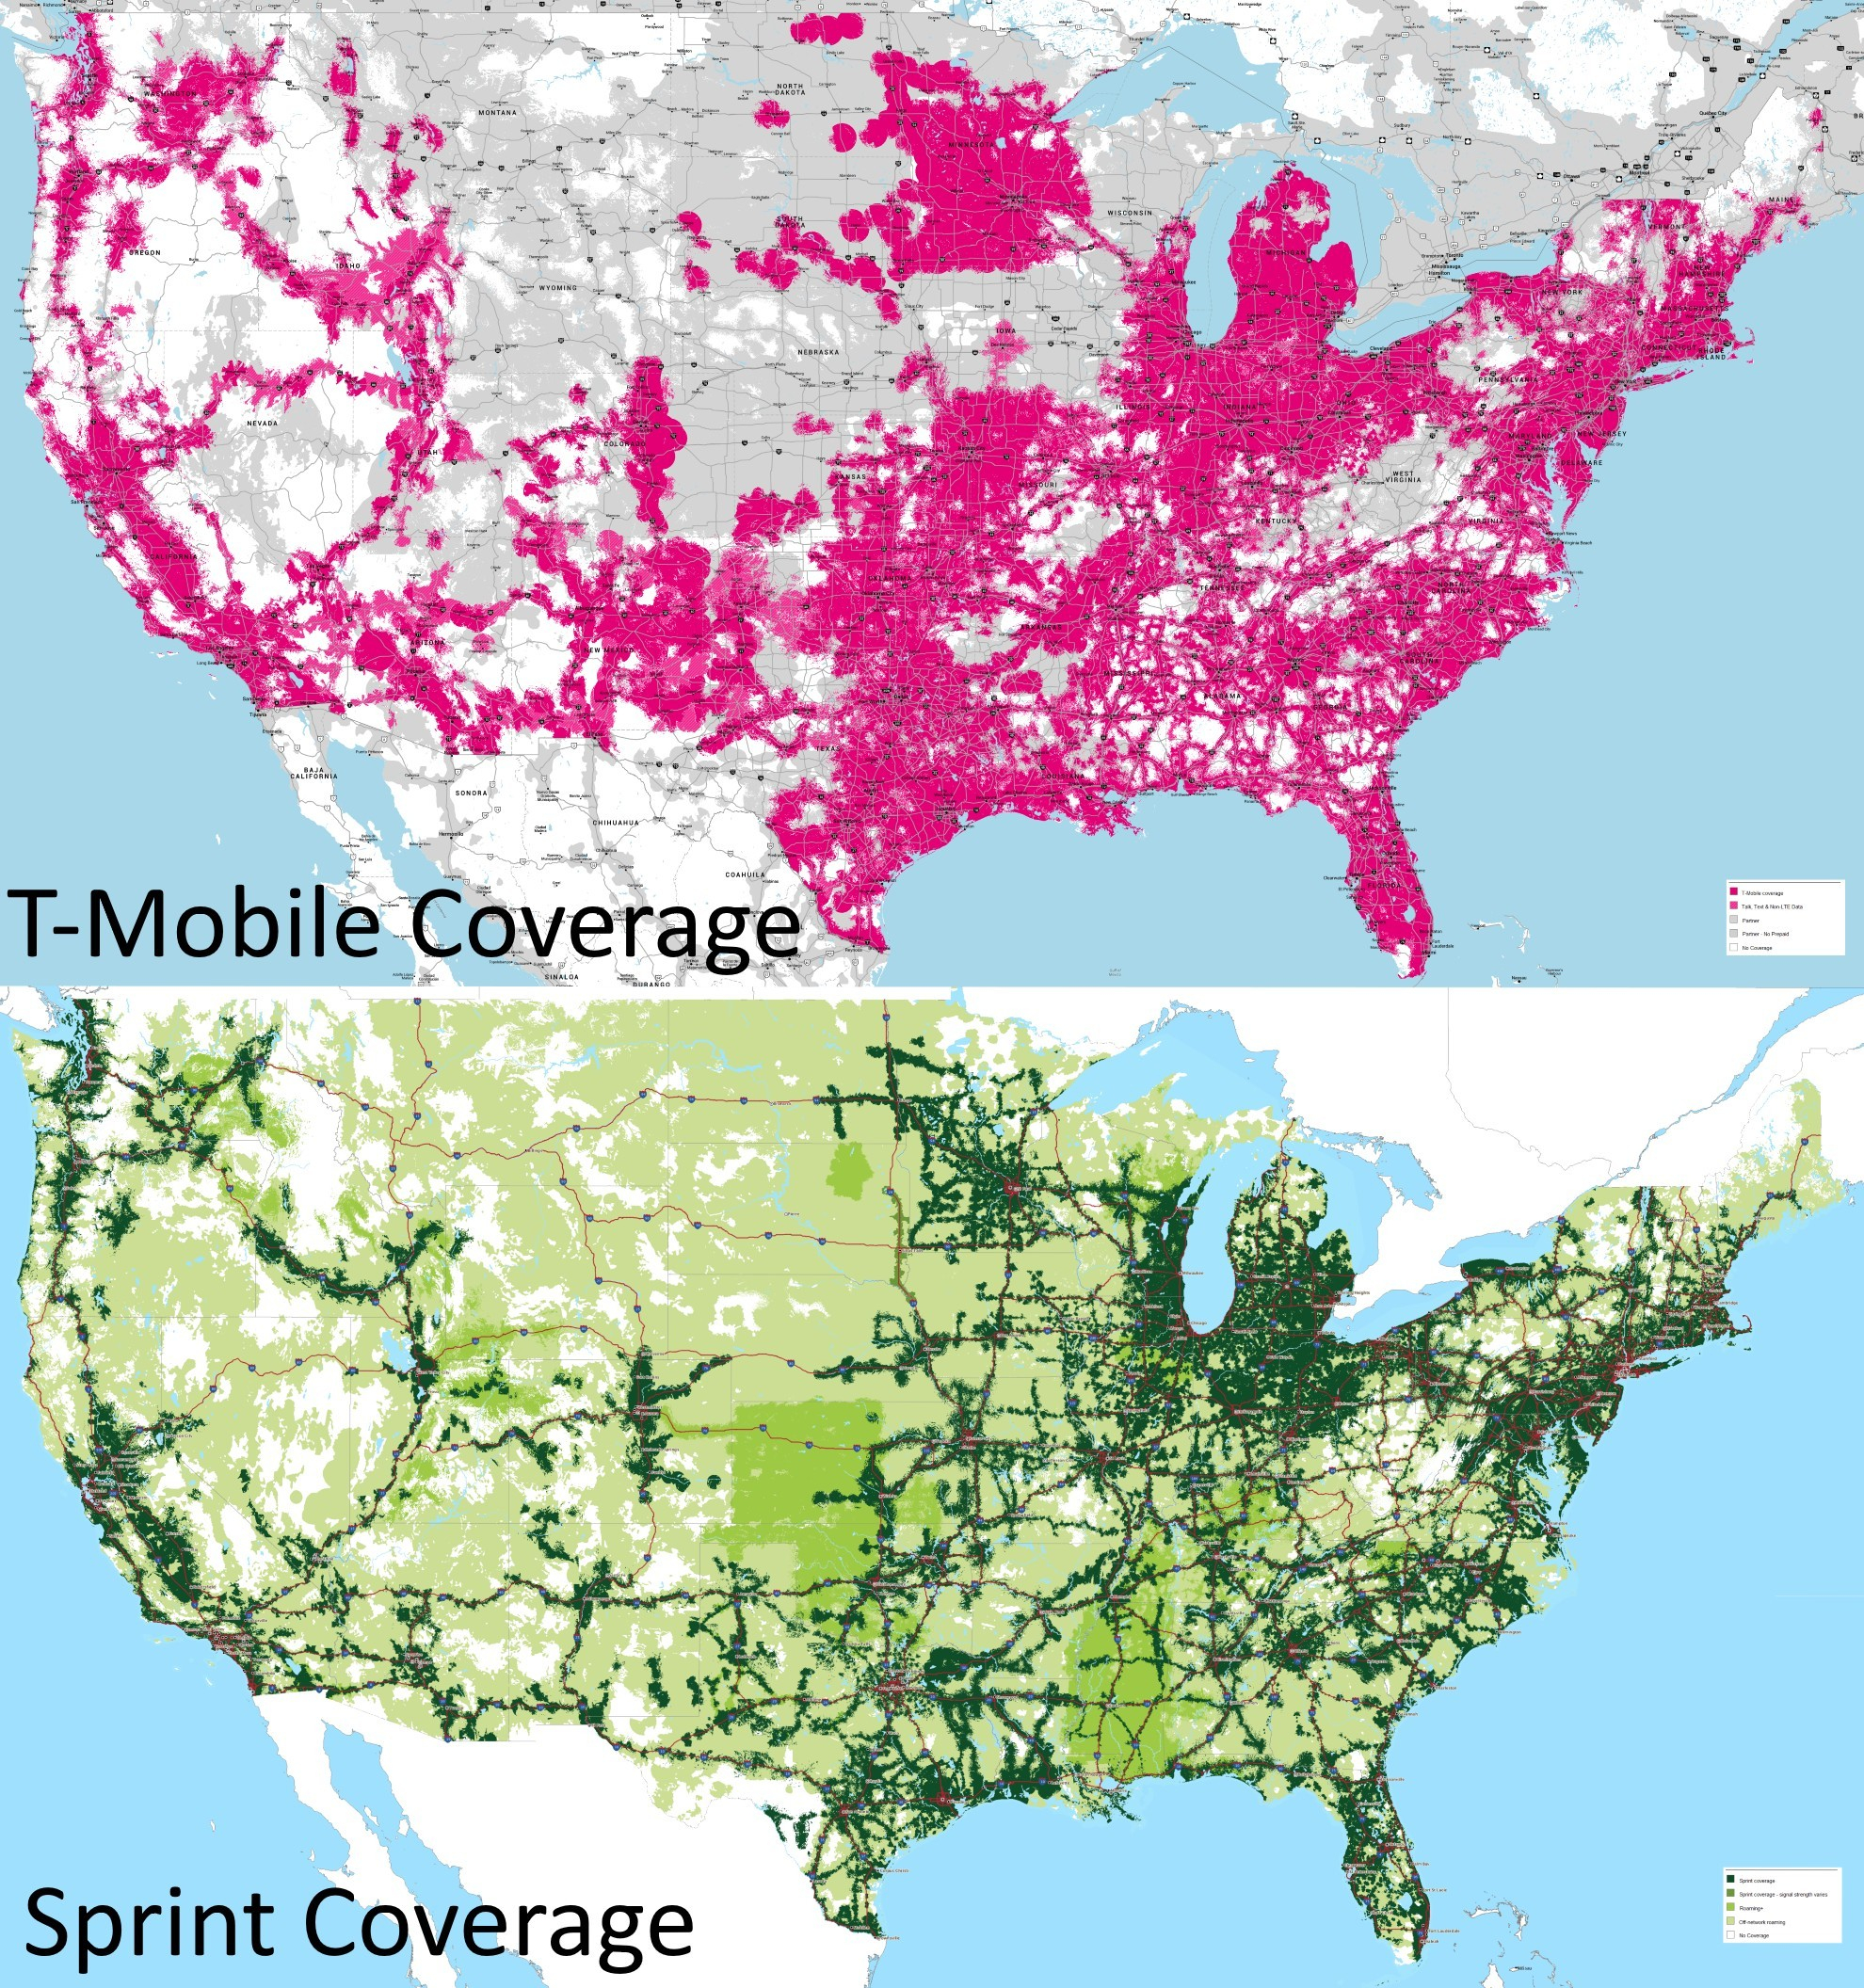 Sprint Us Coverage Map 2016 Sprintspectrumusmap Lovely Sprint - Sprint Cell Coverage Map Texas